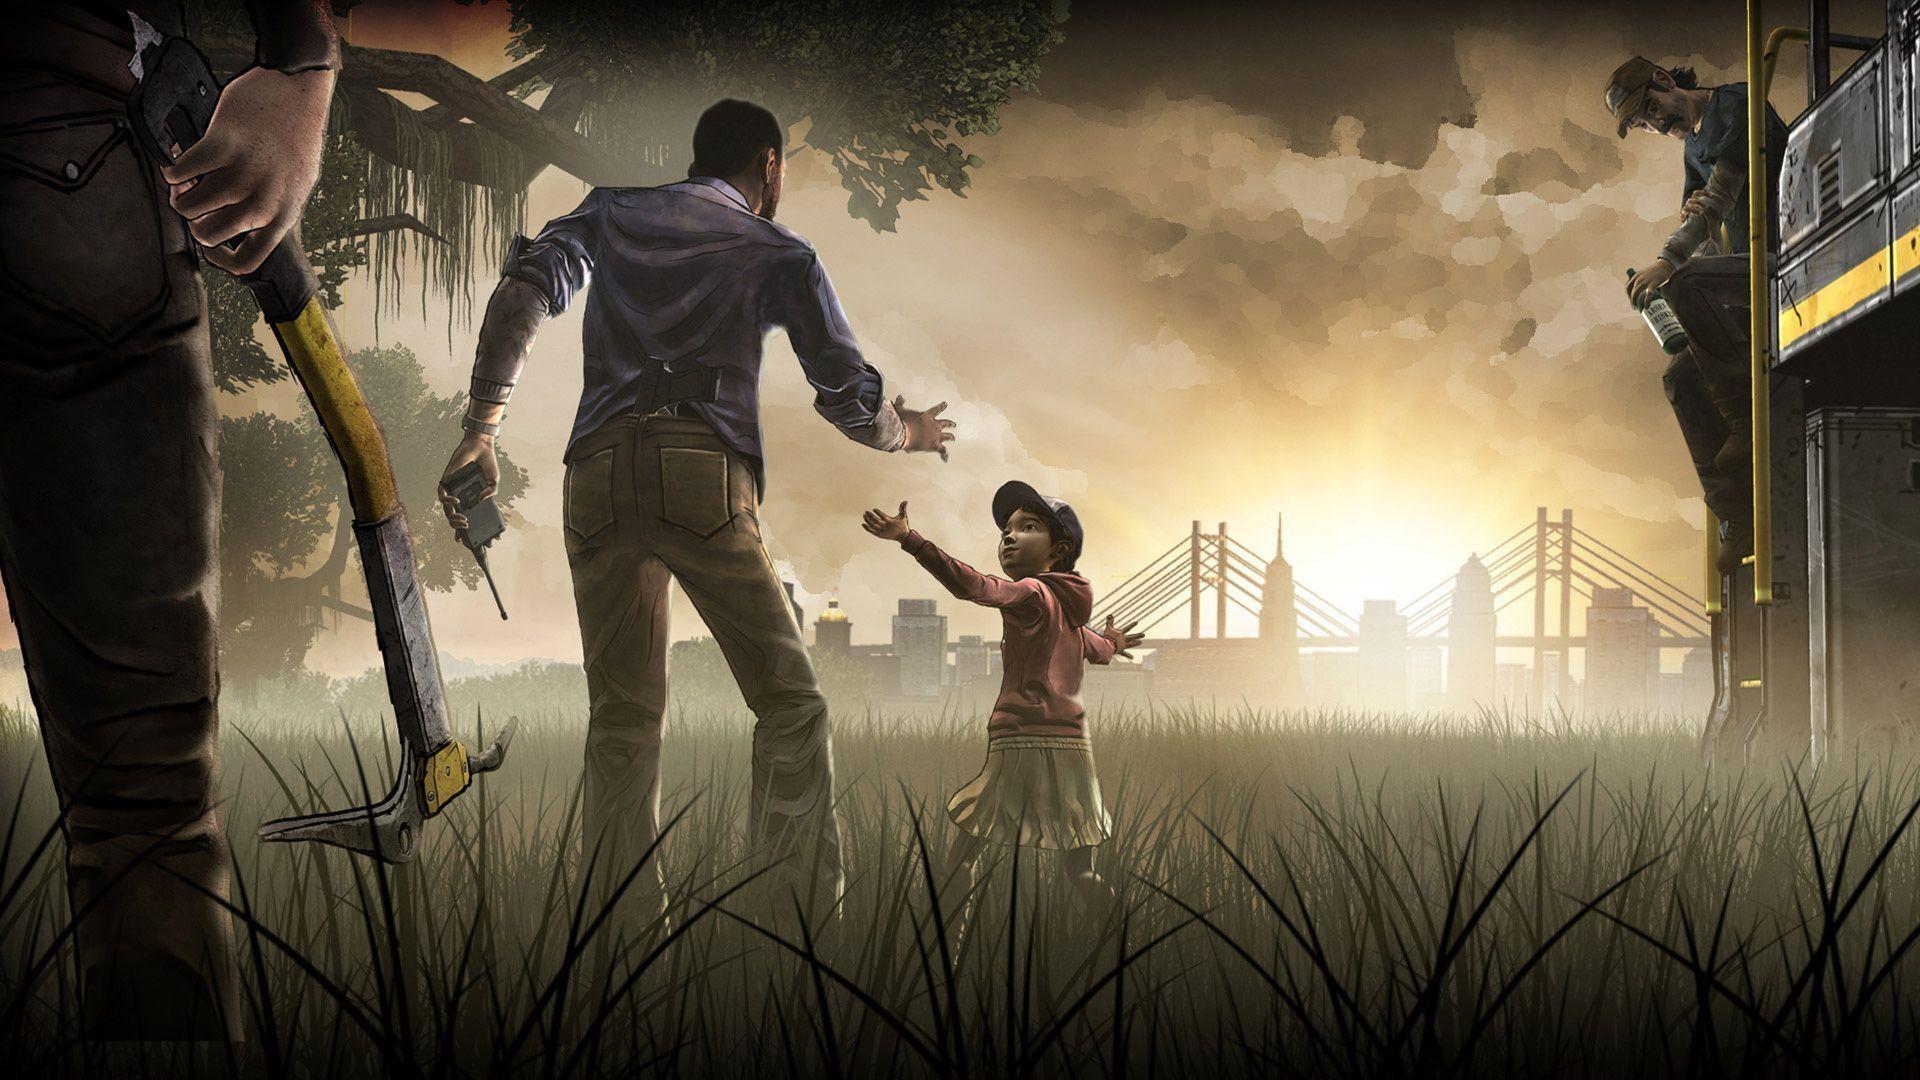 the walking dead season 1 game download full